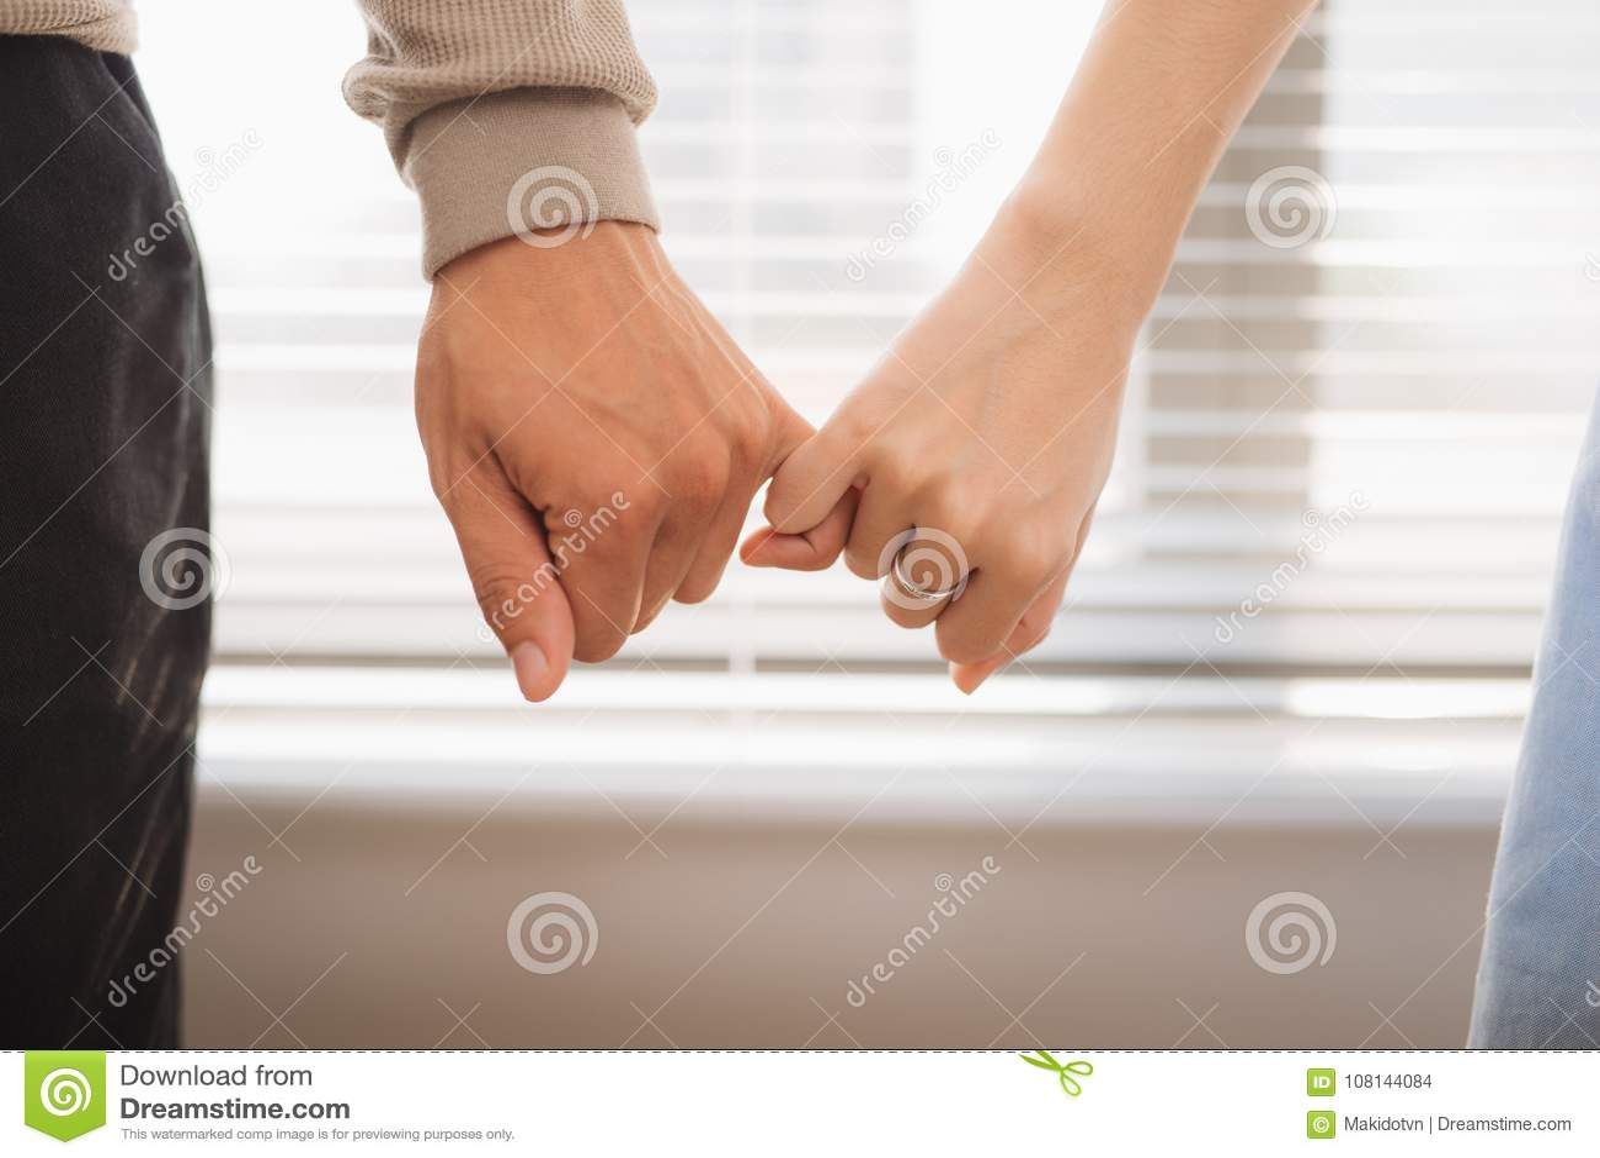 hook up hand